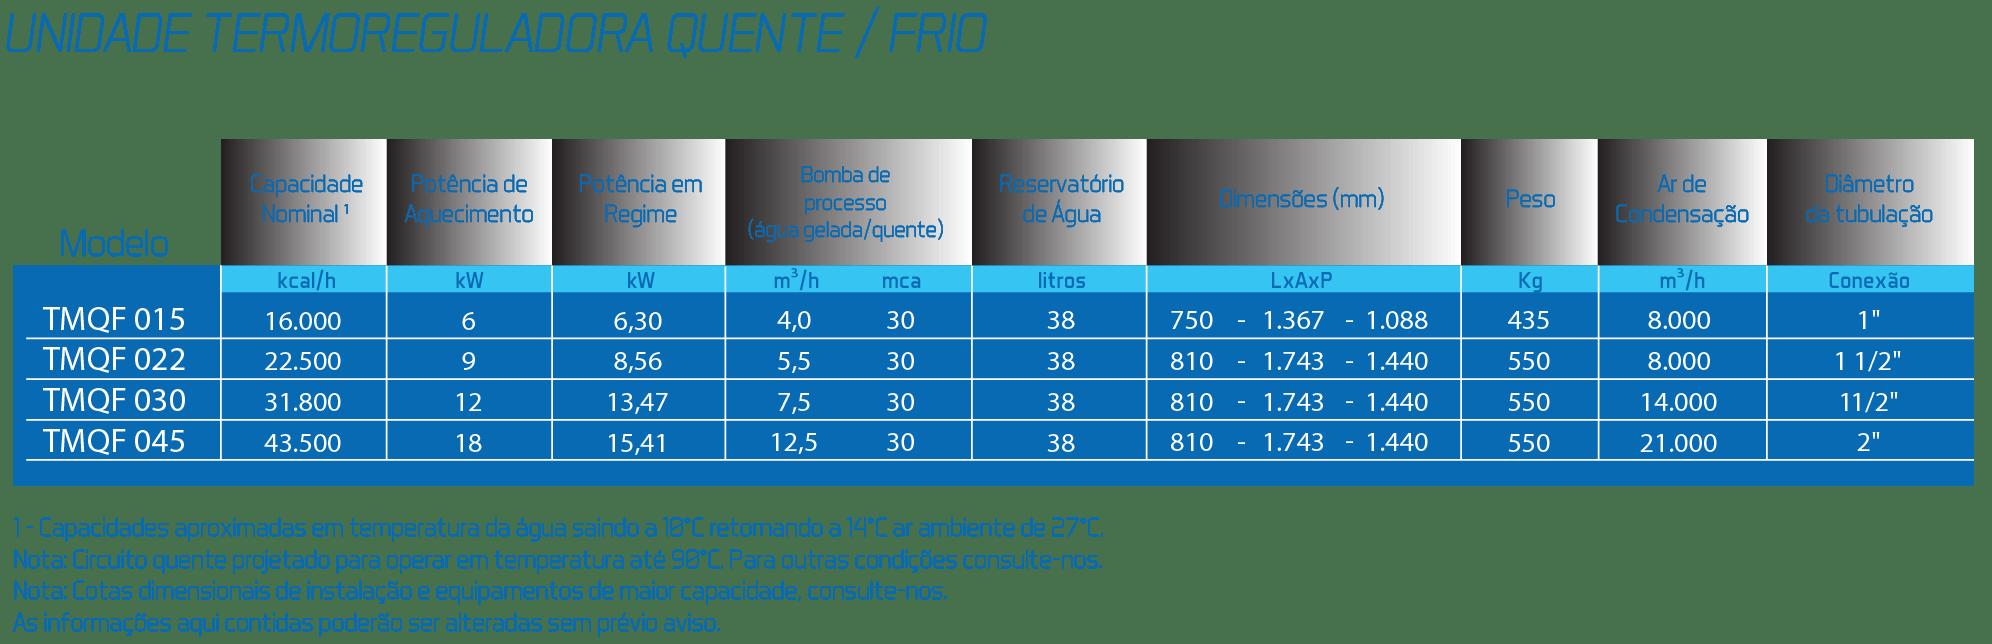 infografico-12